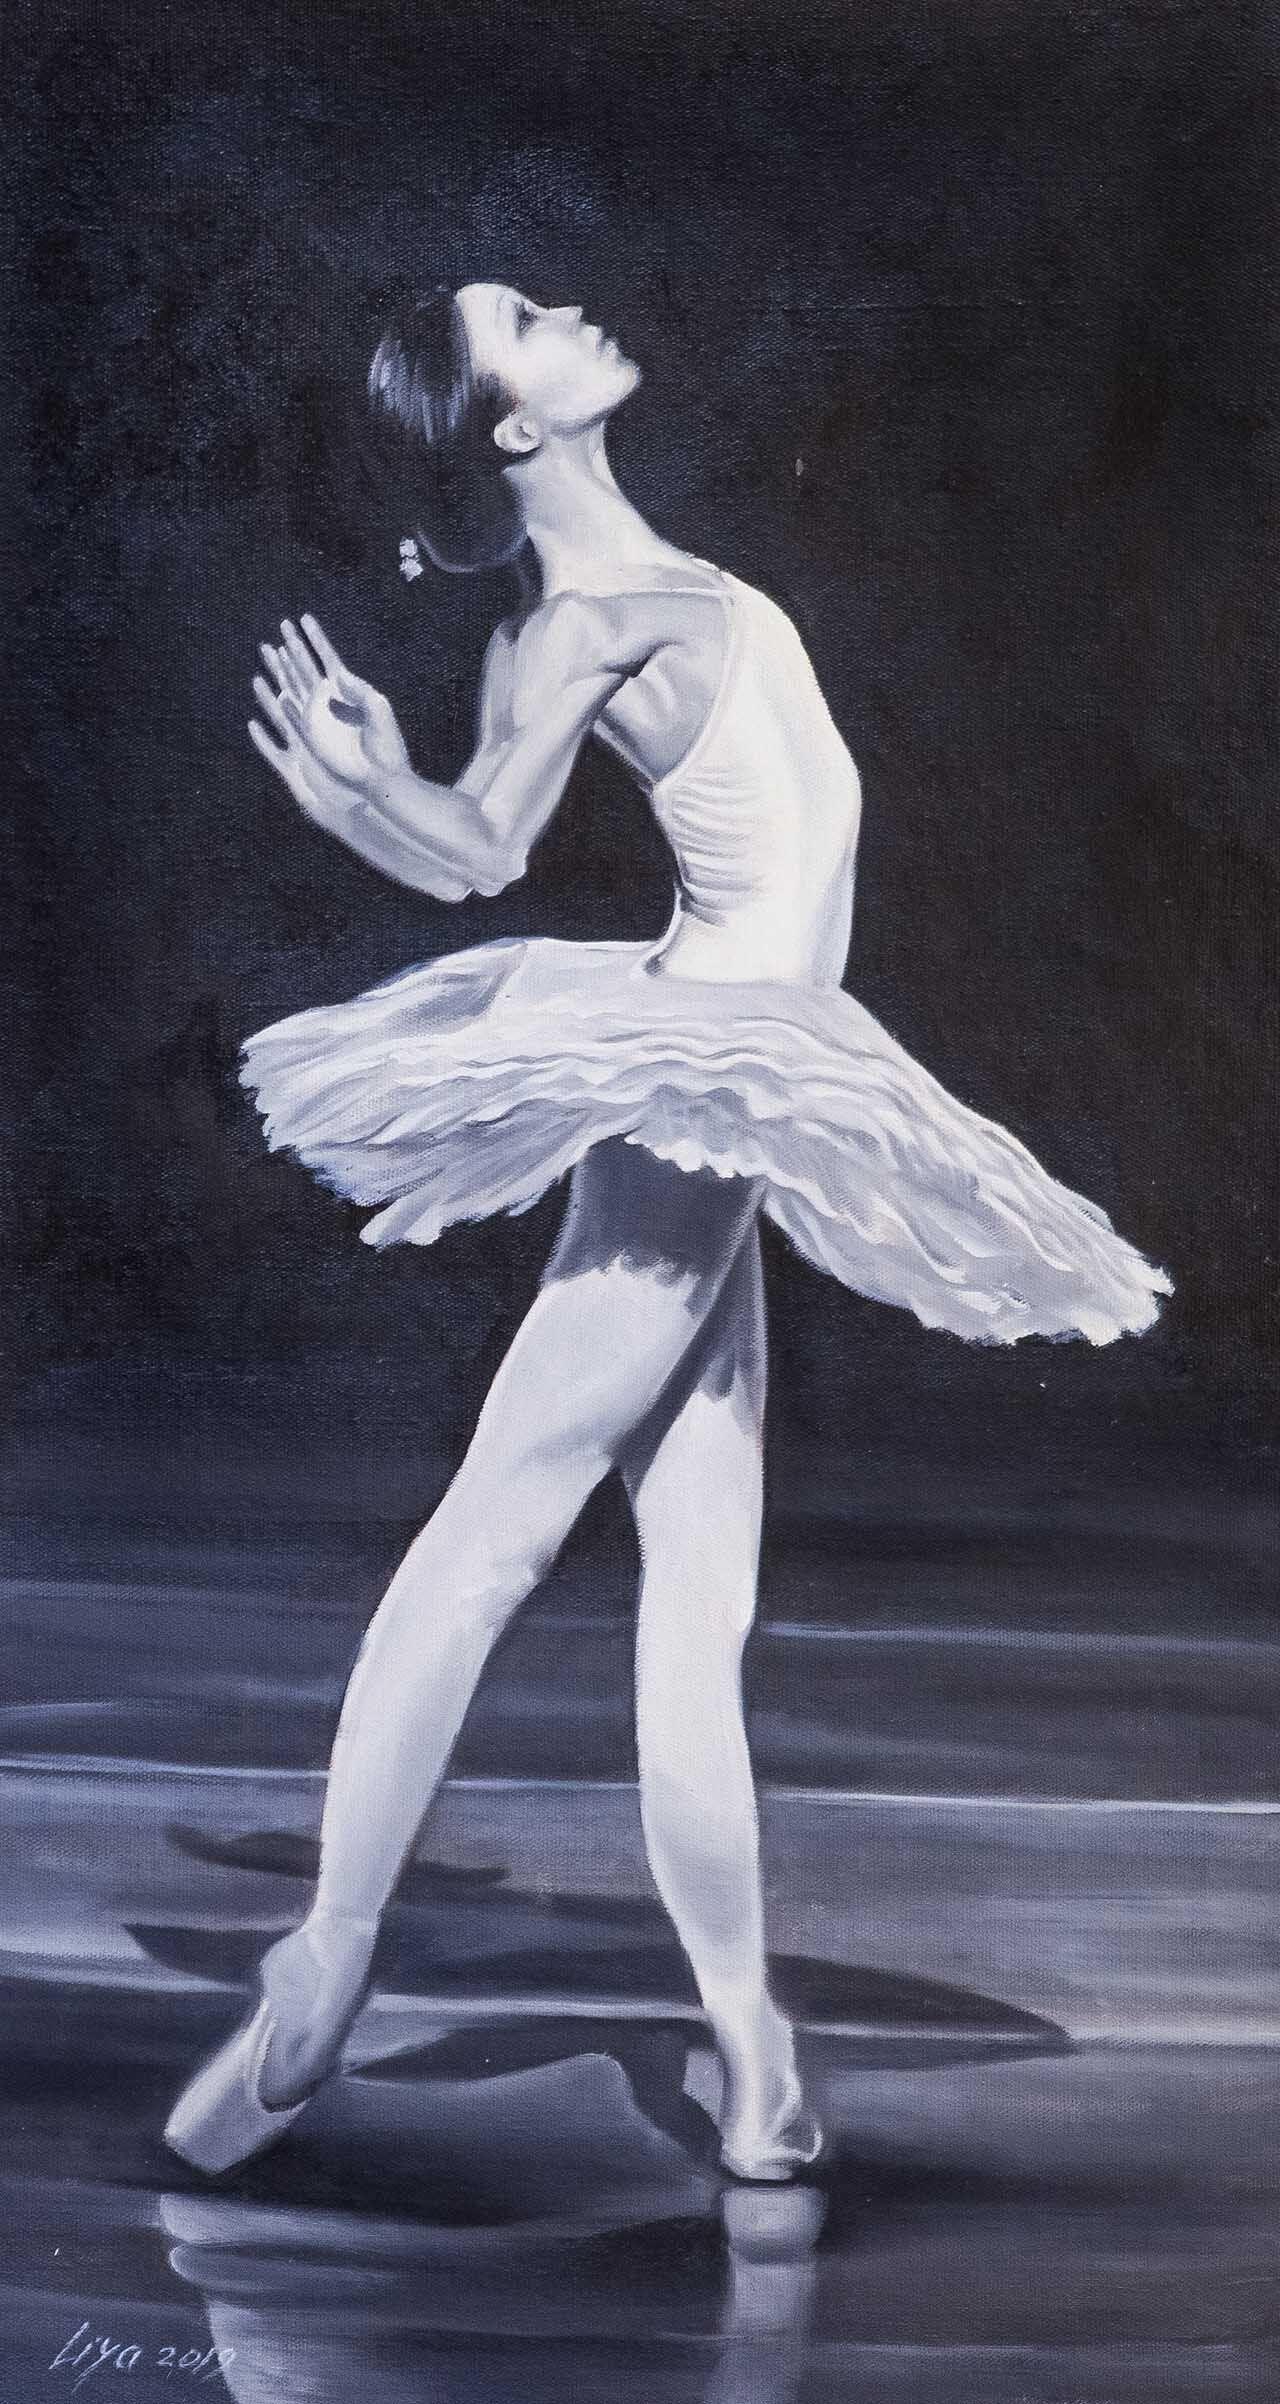 (no name). Ballerina. White Swan Dance